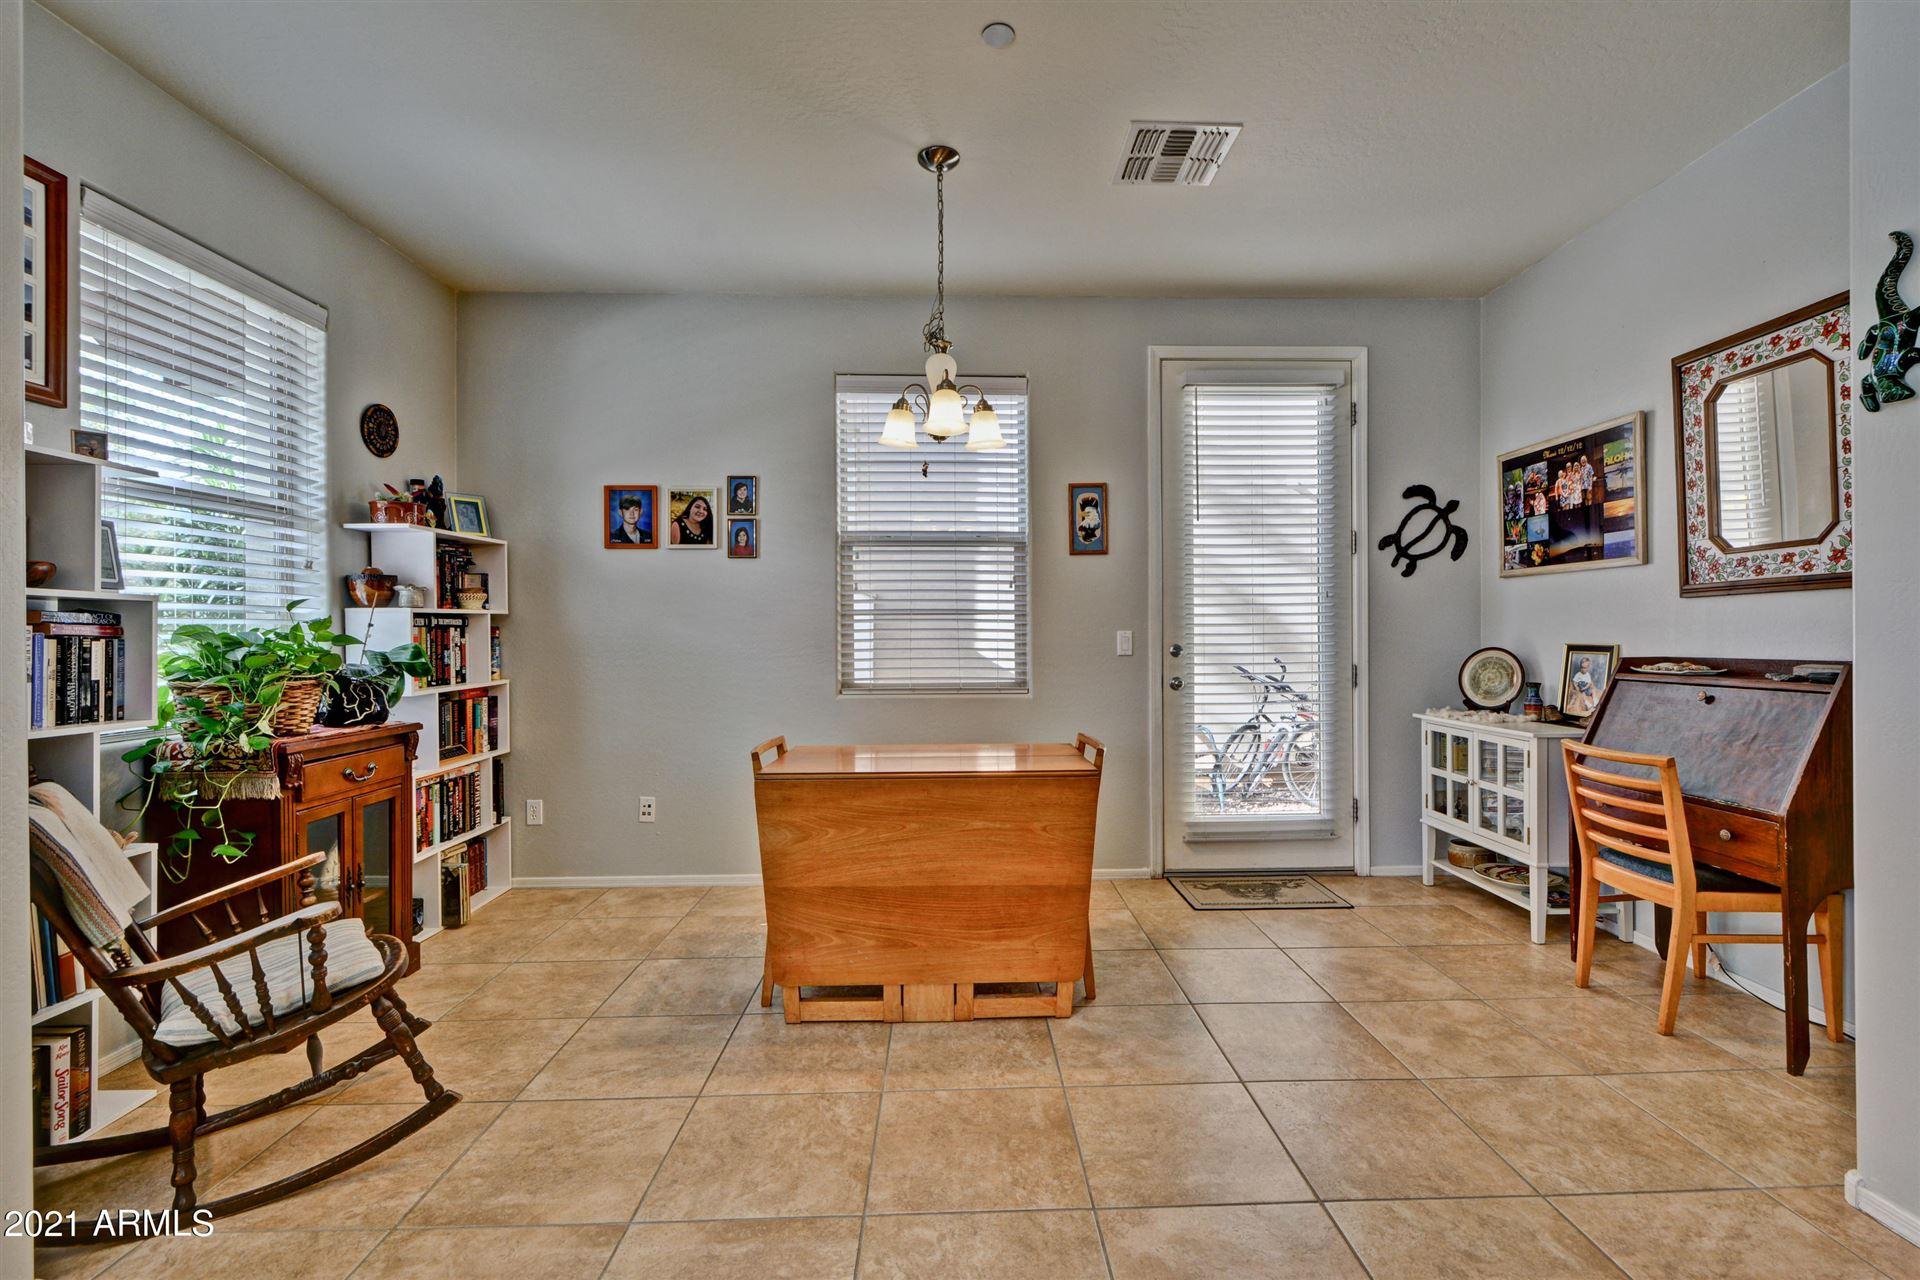 Photo of 20755 W WHITE ROCK Road, Buckeye, AZ 85396 (MLS # 6198826)